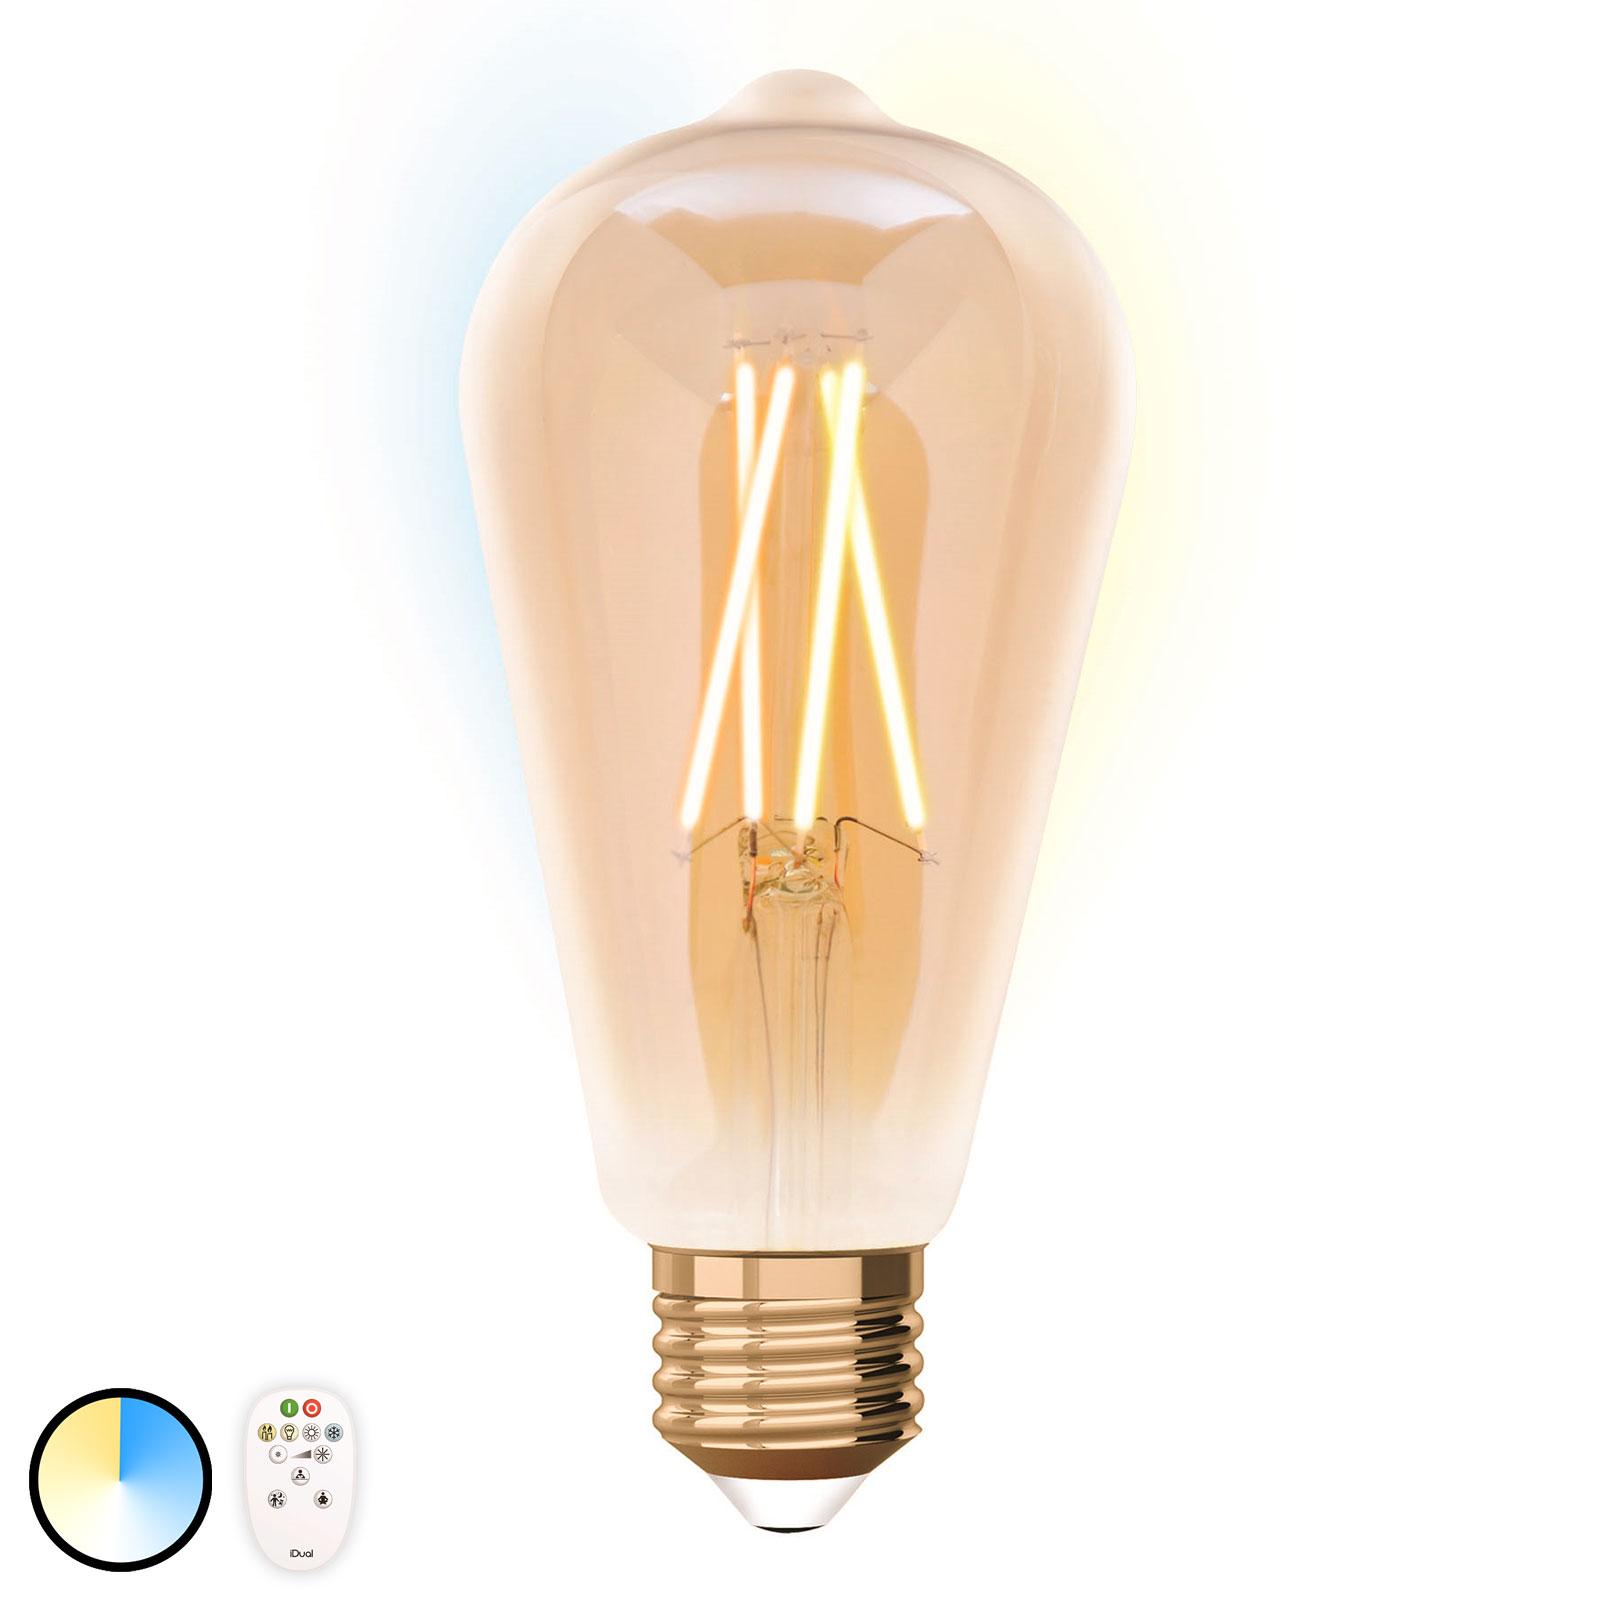 iDual LED-Lampe E27 ST64 9W mit Fernbedienung